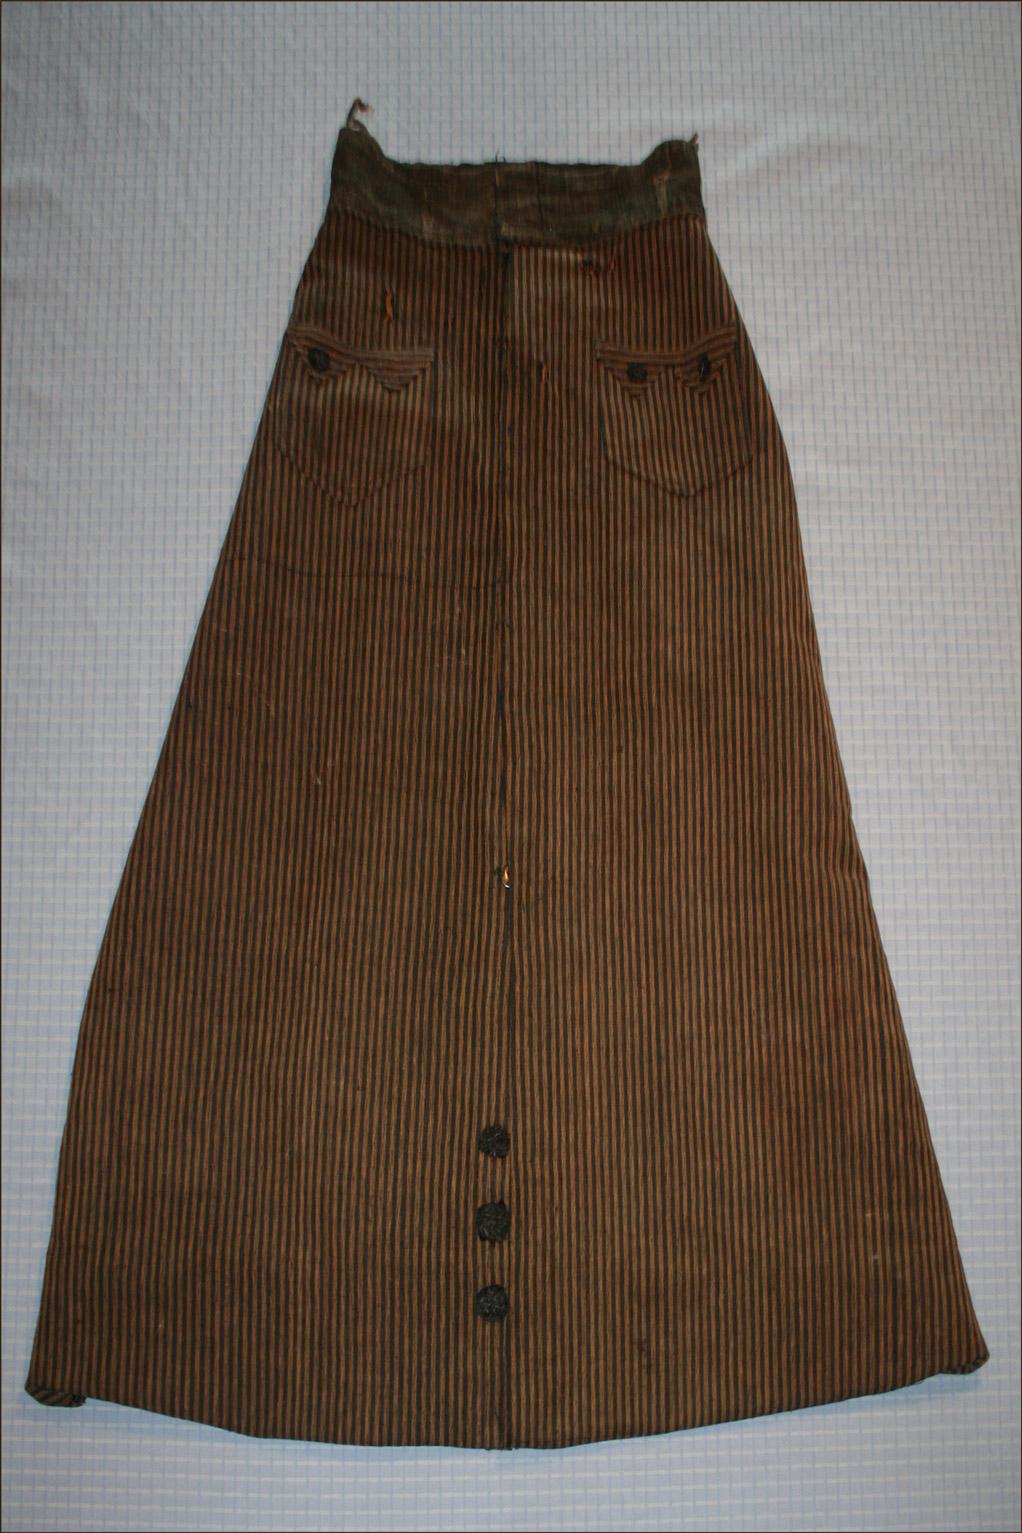 Ma's Skirt